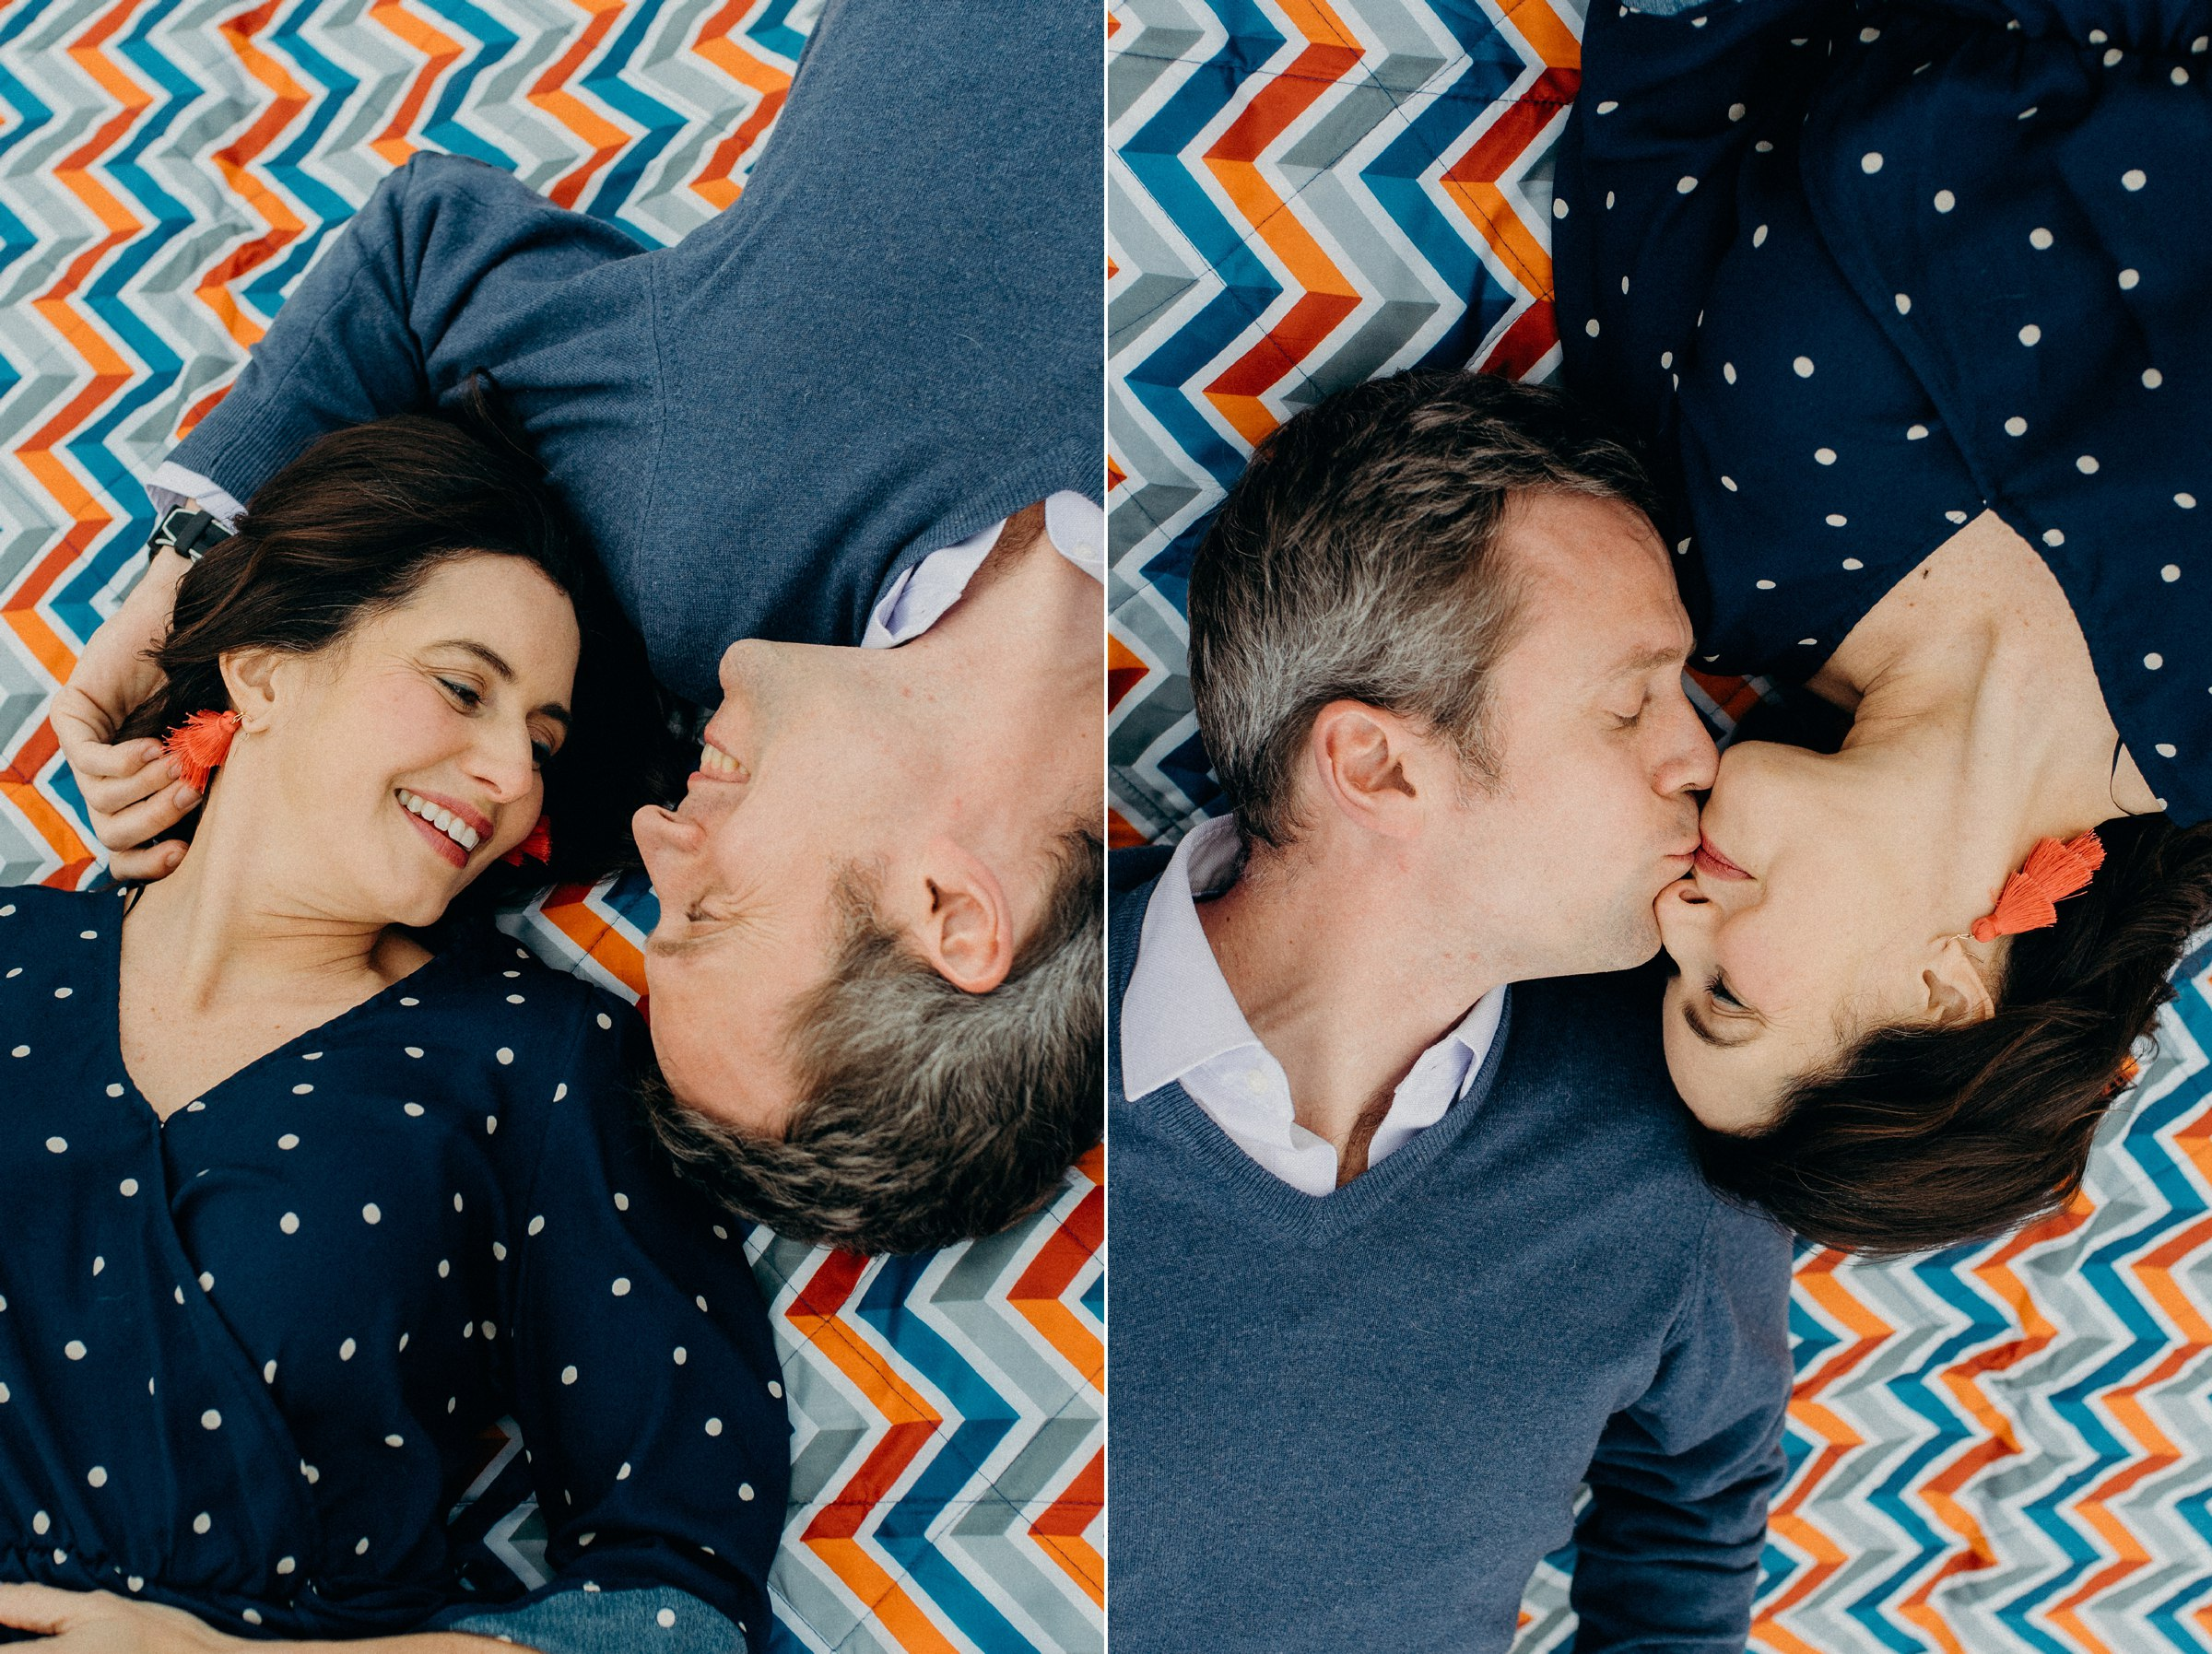 austin-mckinney-falls-engagement-photographer-elopement-prices-best-headshot-senior-adventurous-italy-minneapolis-texas-minnesota-dallas-houston-tulum-mexico_0024.jpg